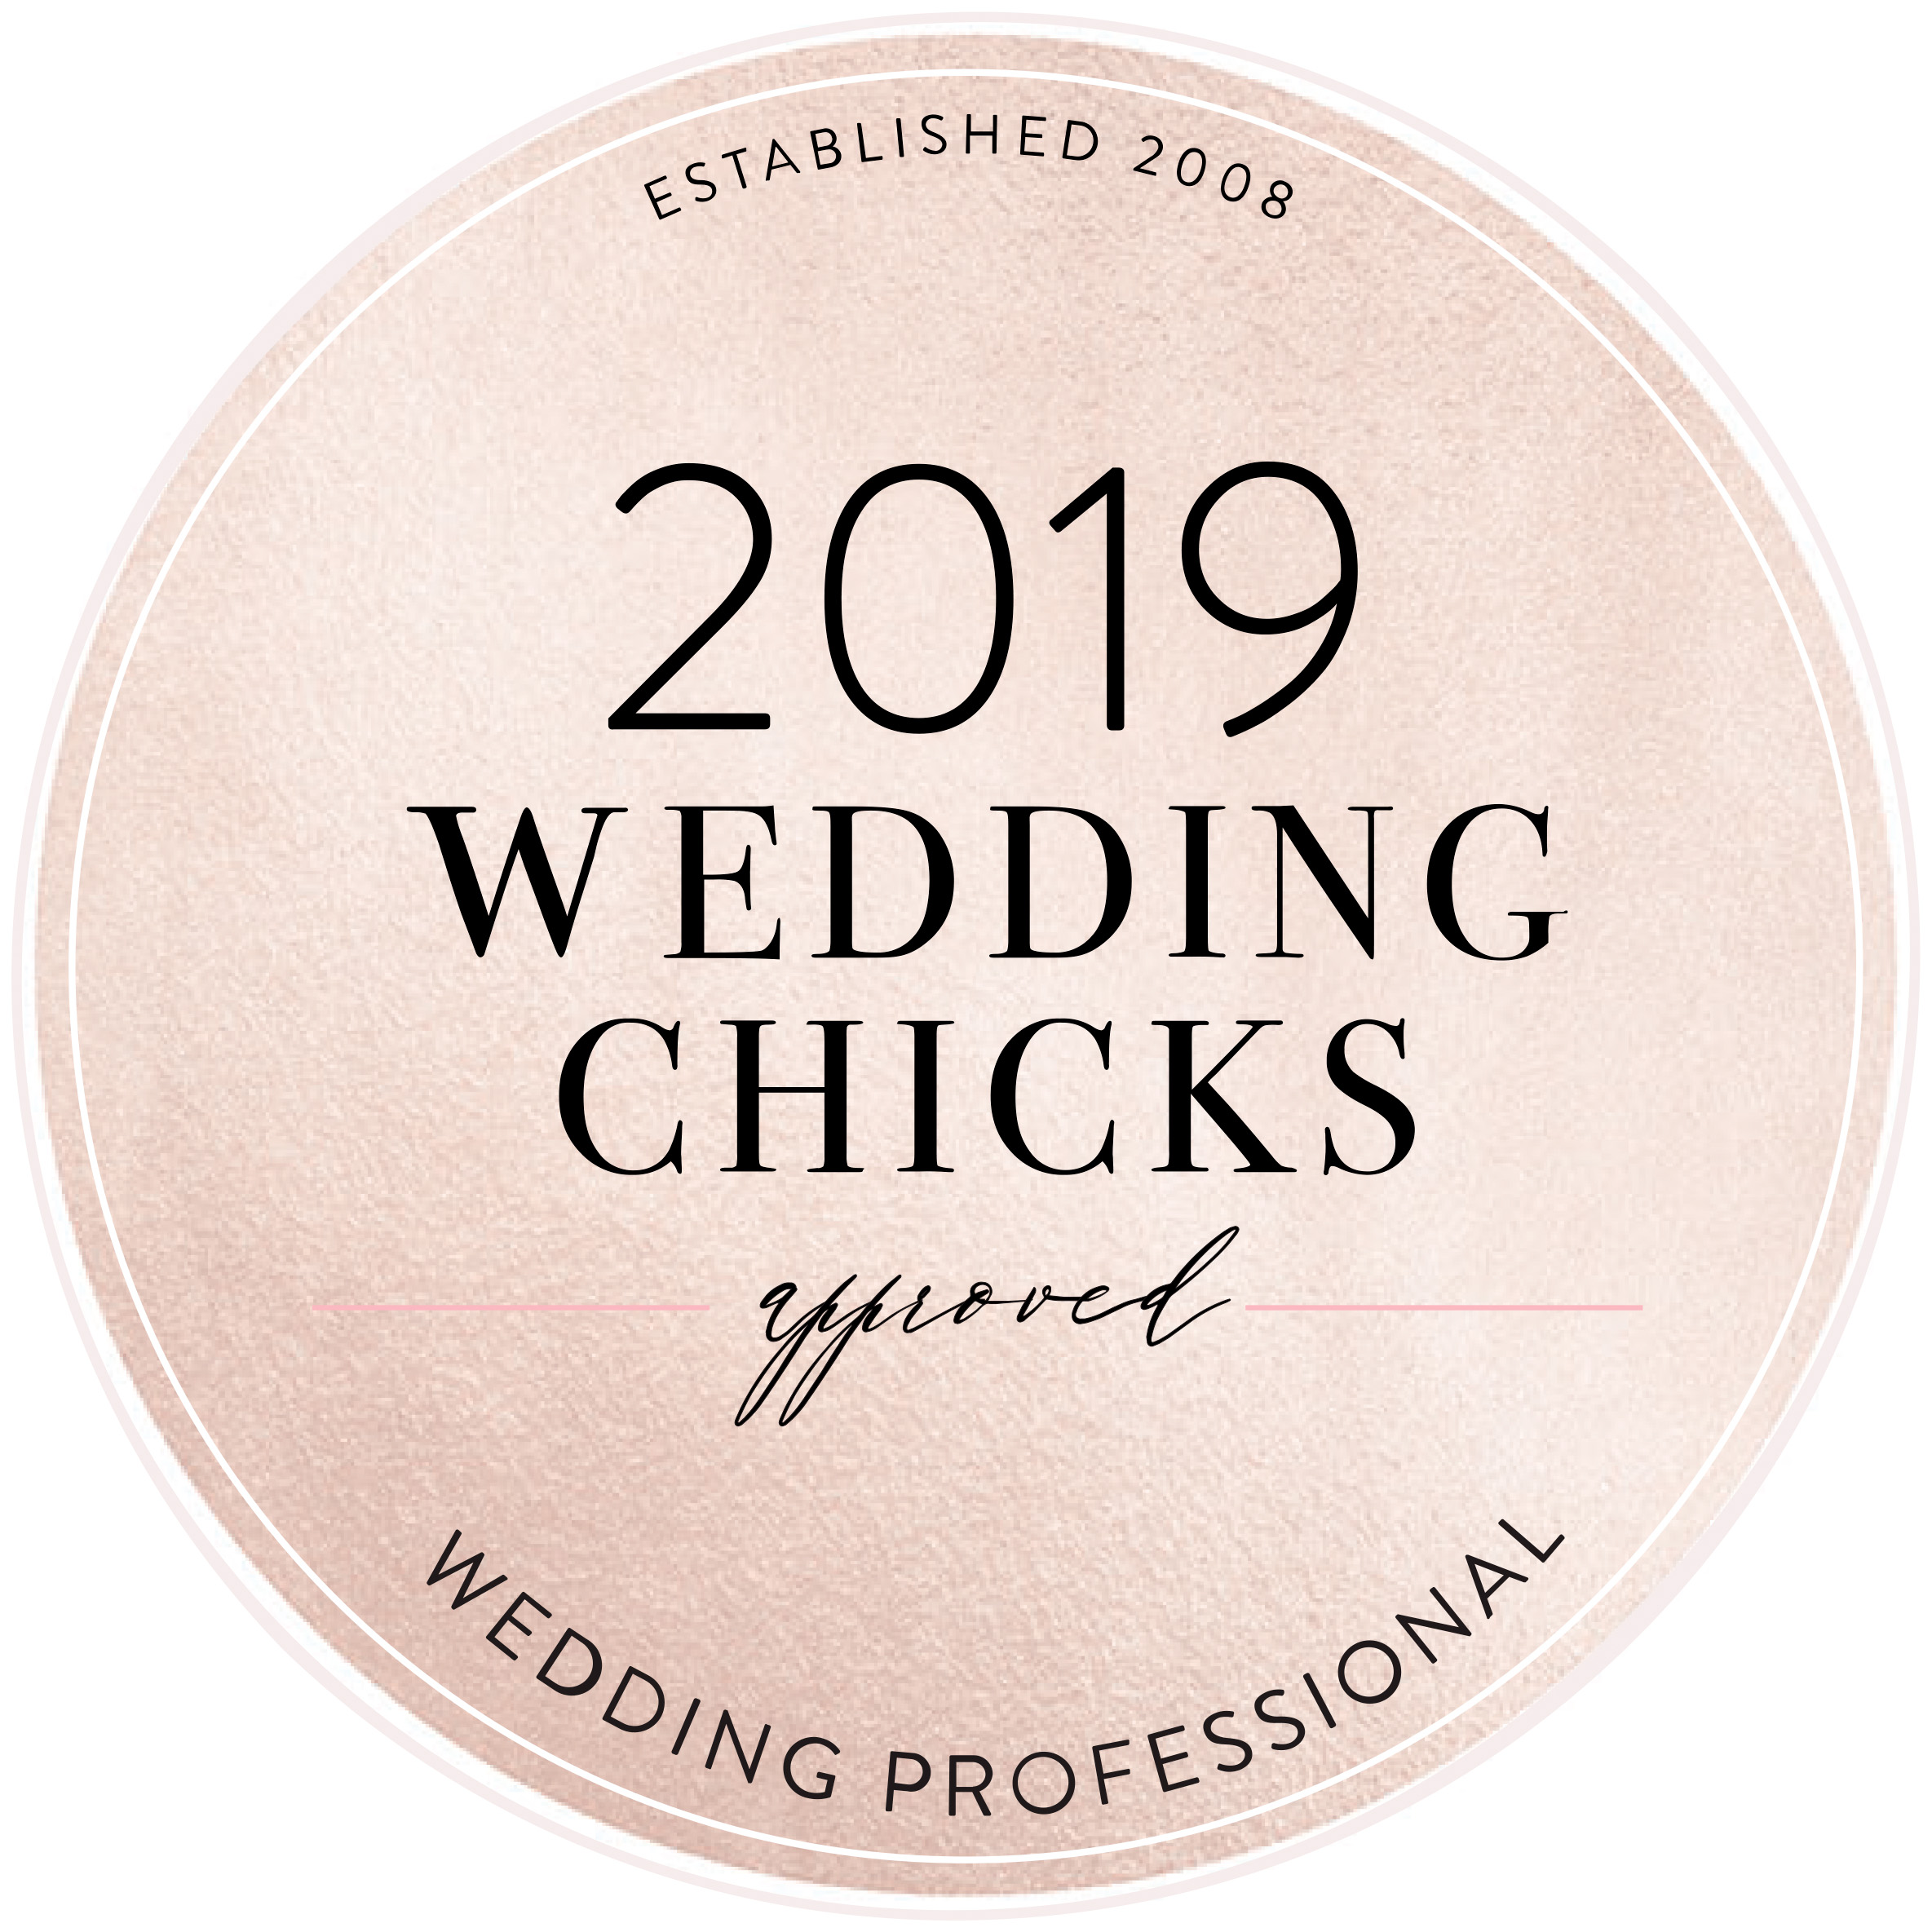 wedding-chicks-amalfi-sorrento-1.jpg